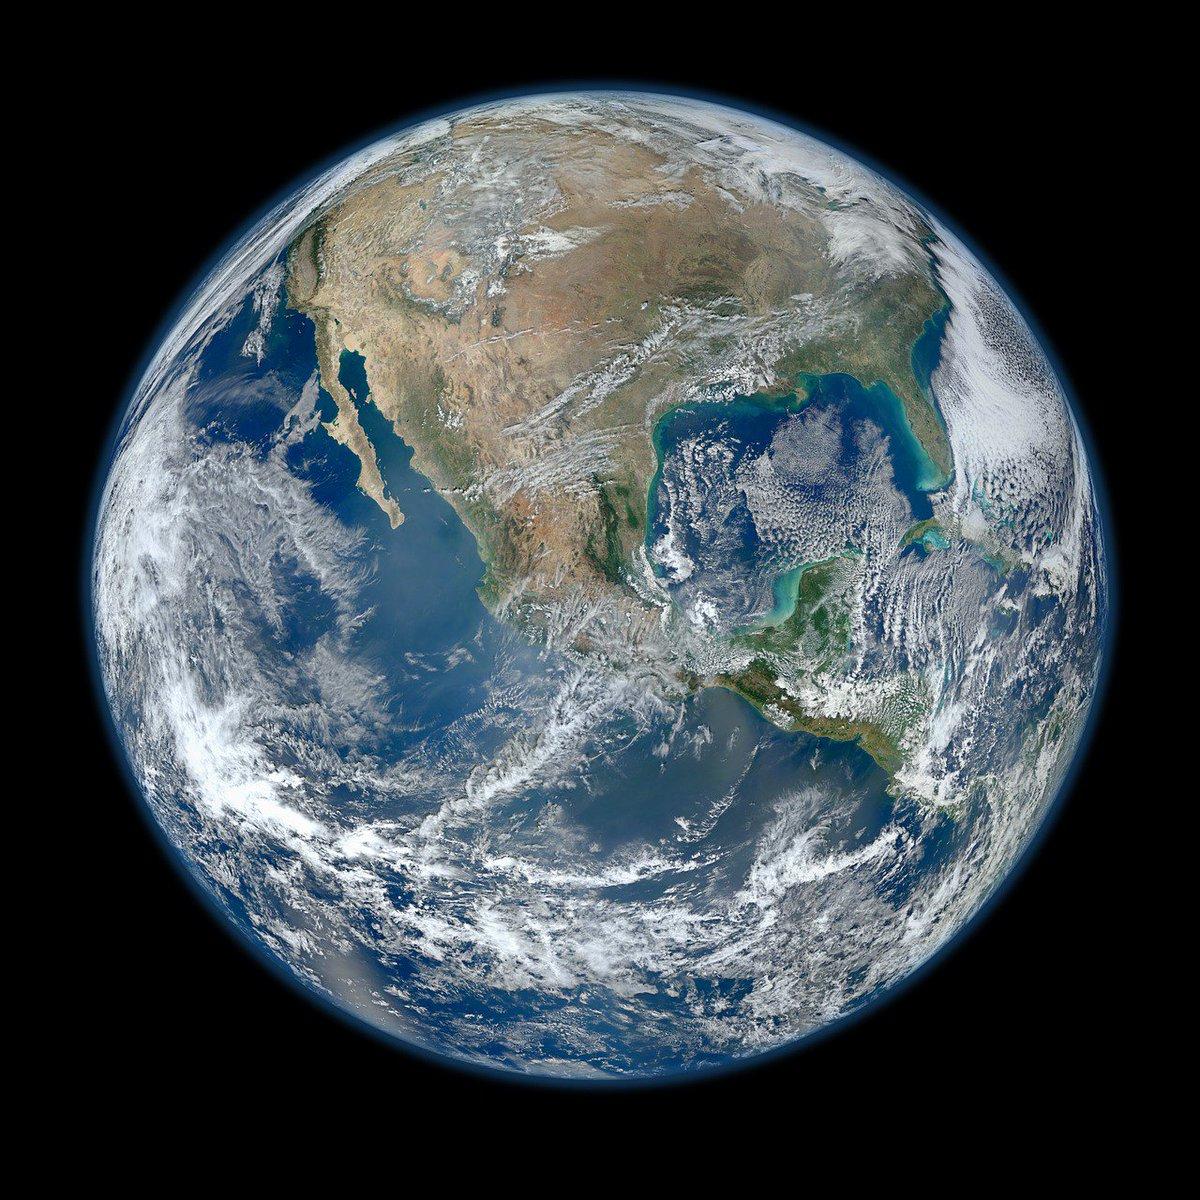 La planète fictive Nibiru n'entrera pas en collision avec la Terre, assure la NASA https://t.co/8ksXpSn1S1